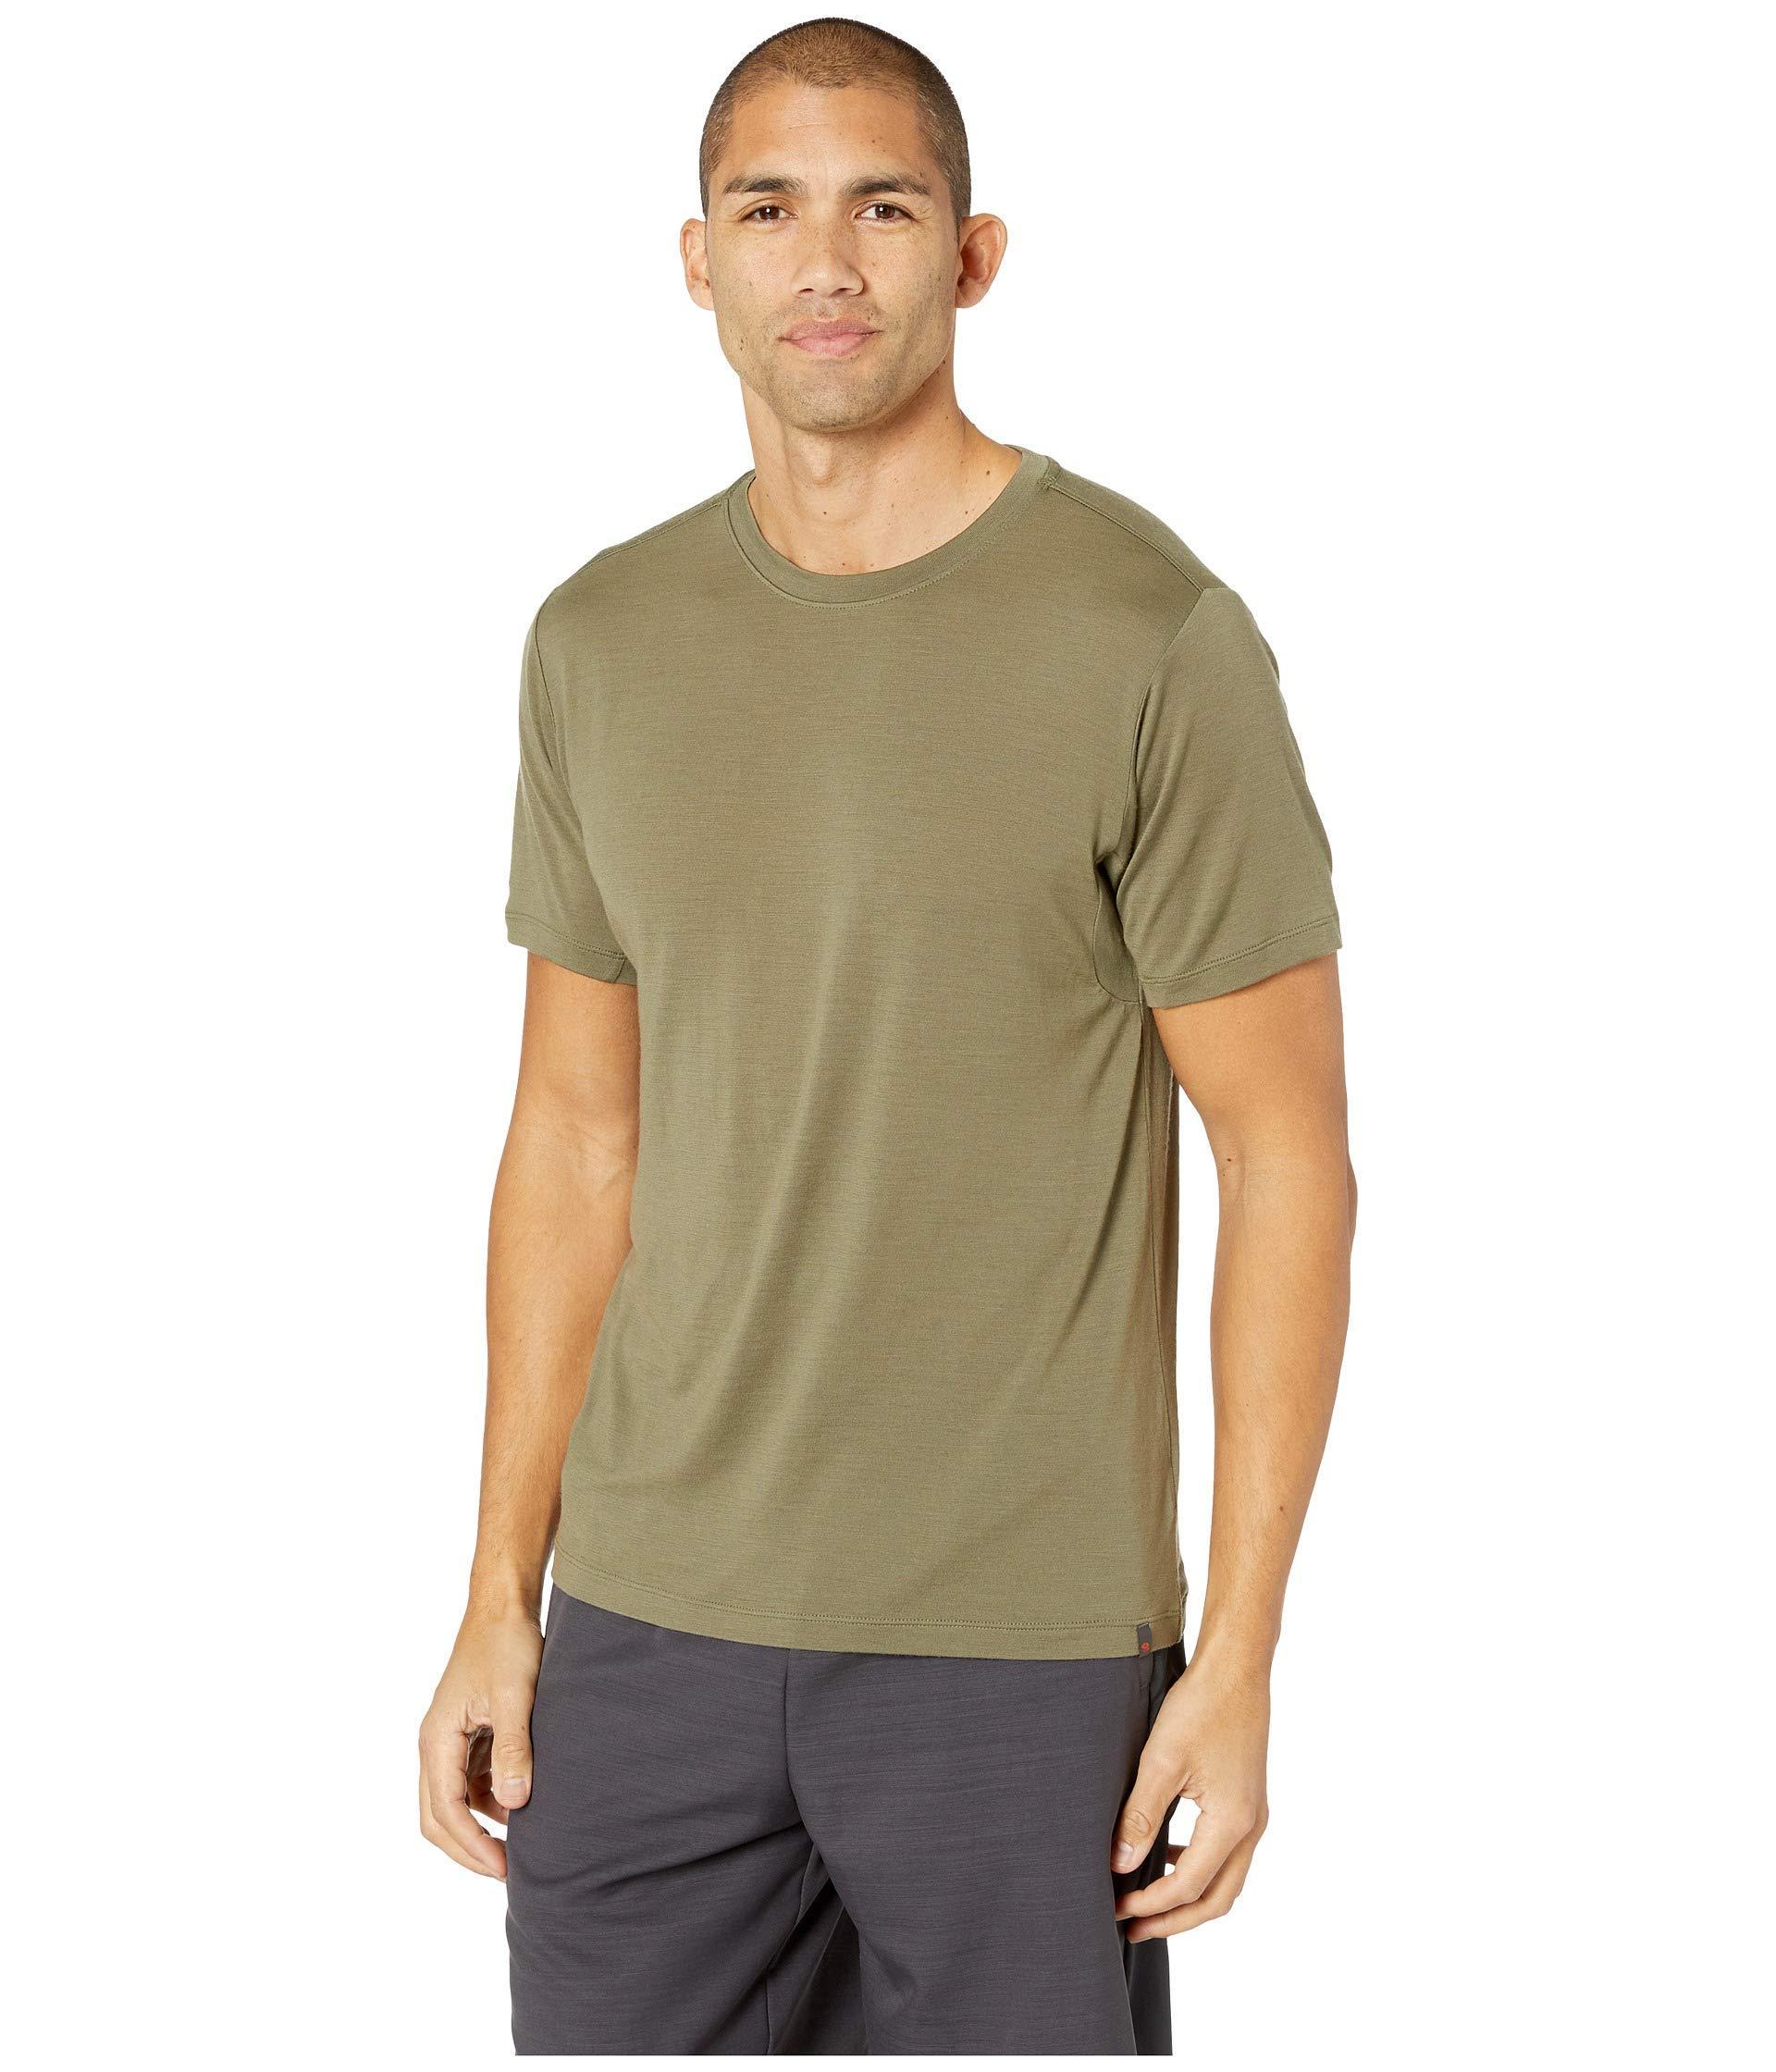 b0cb964e Lyst - Mountain Hardwear Diamond Peaktm Short Sleeve Tee (zinc) Men's  Clothing in Green for Men